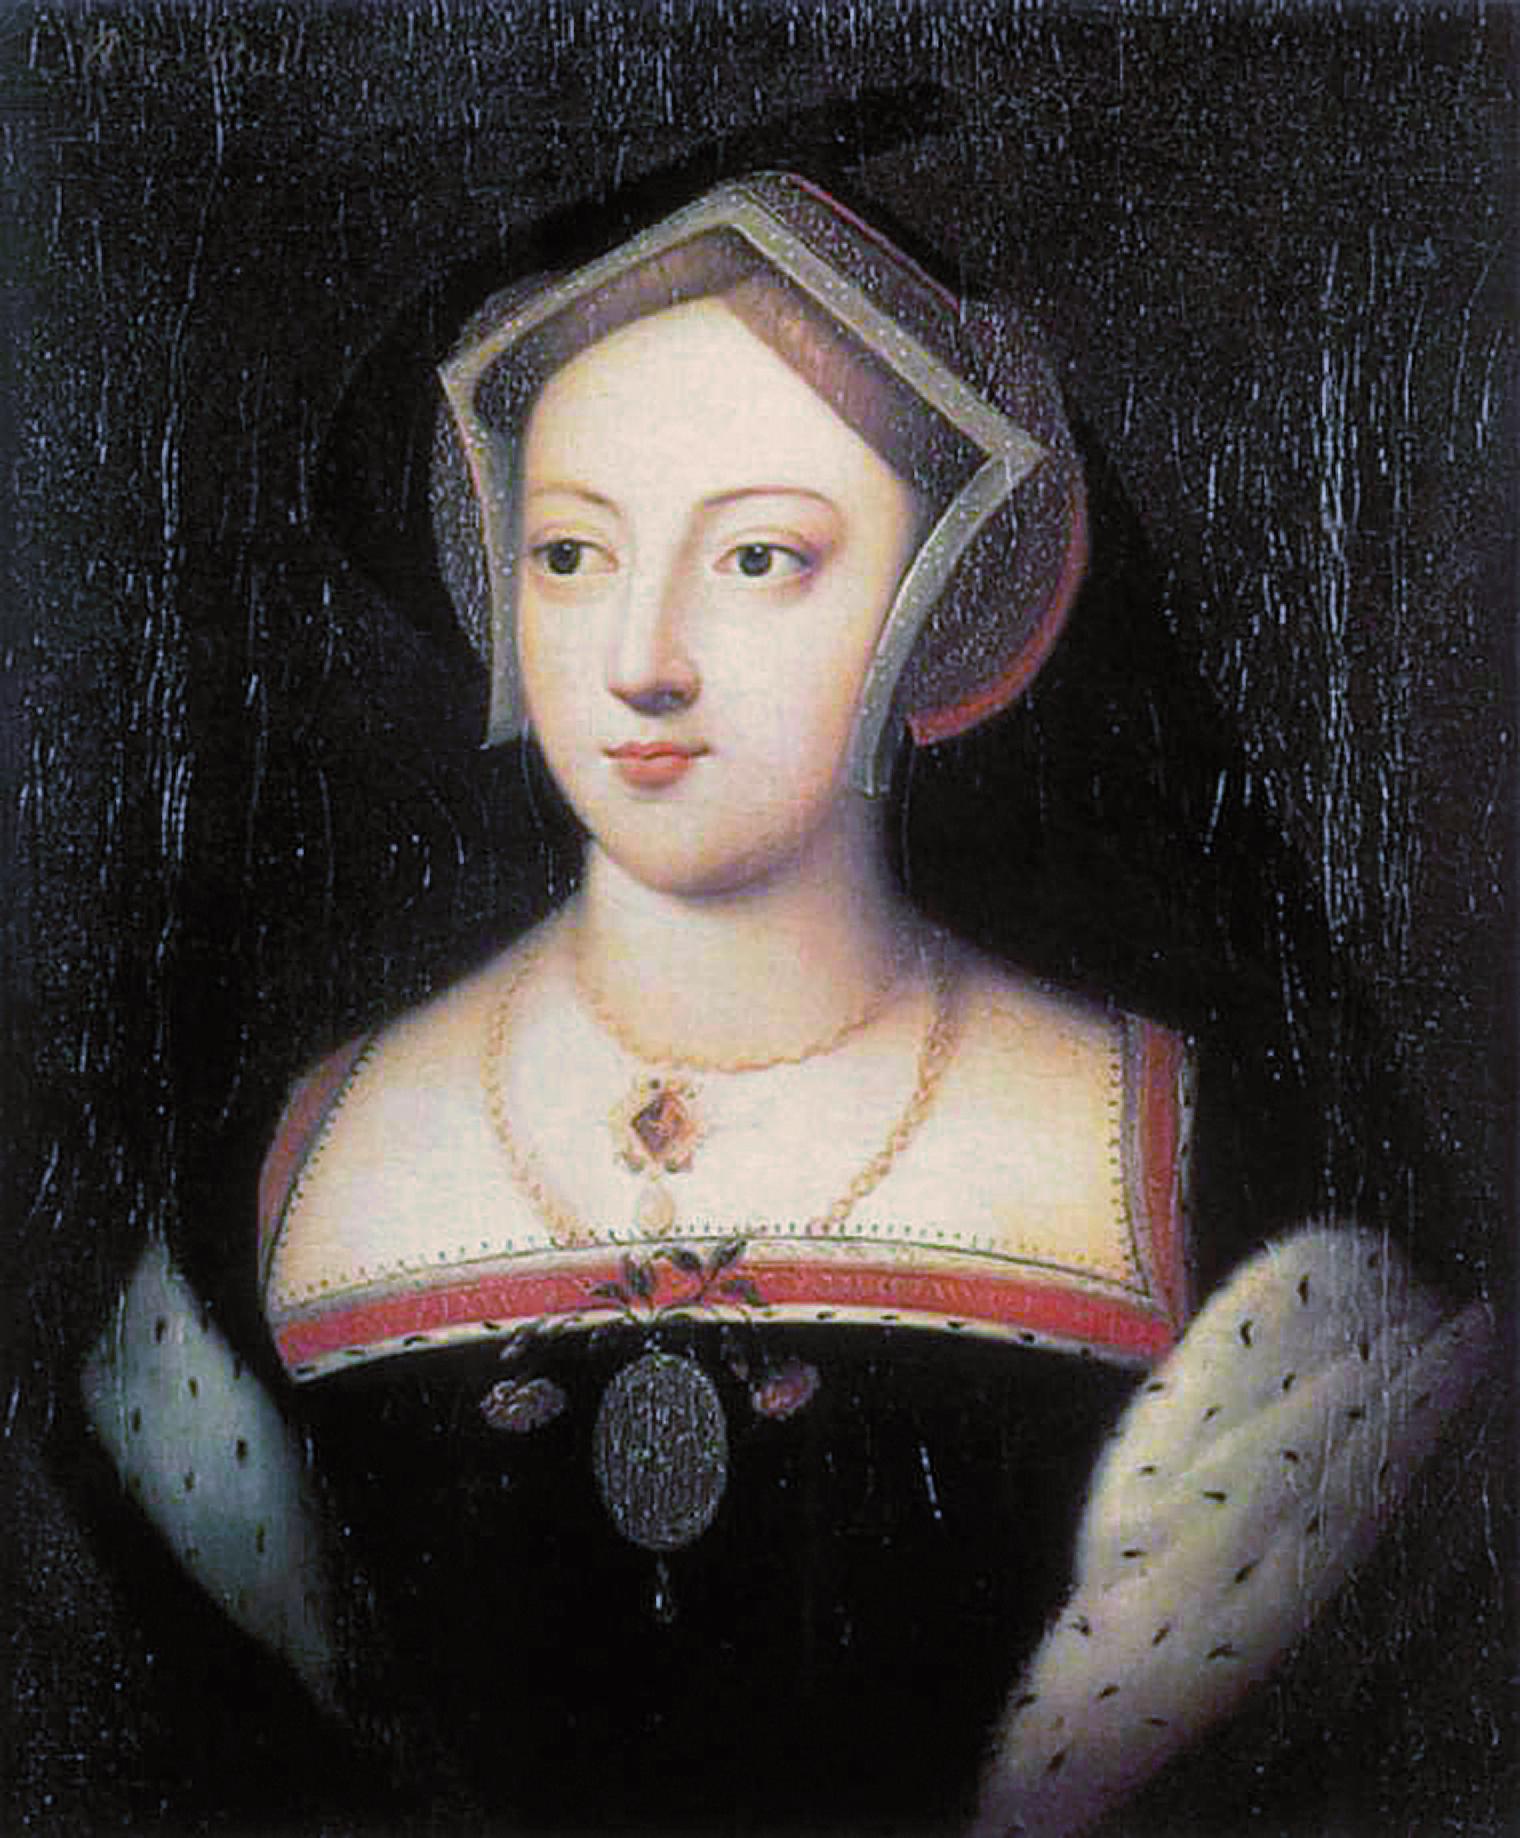 http://upload.wikimedia.org/wikipedia/commons/b/b0/Mary_Boleyn.jpg